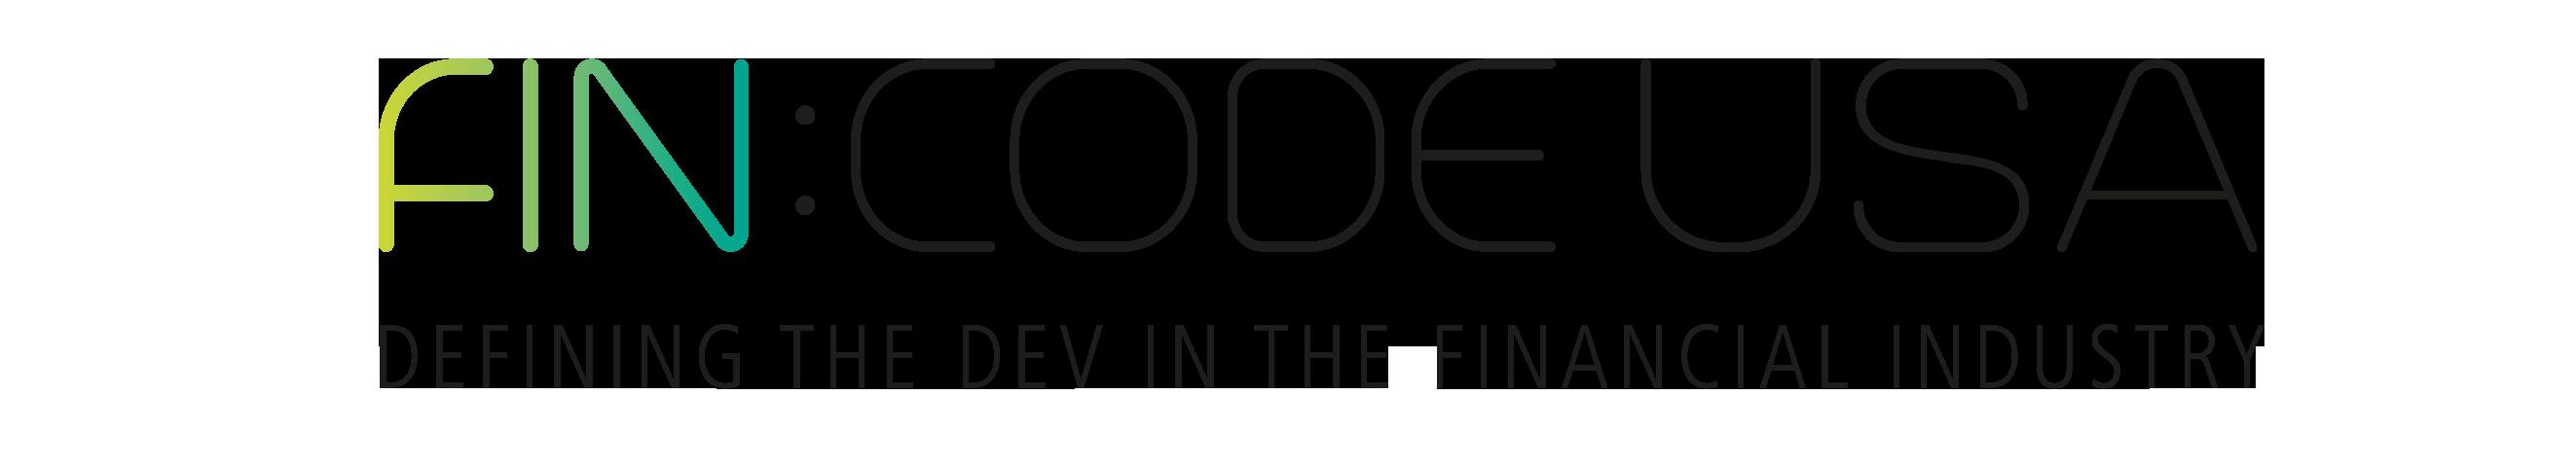 www.fincode-us.com